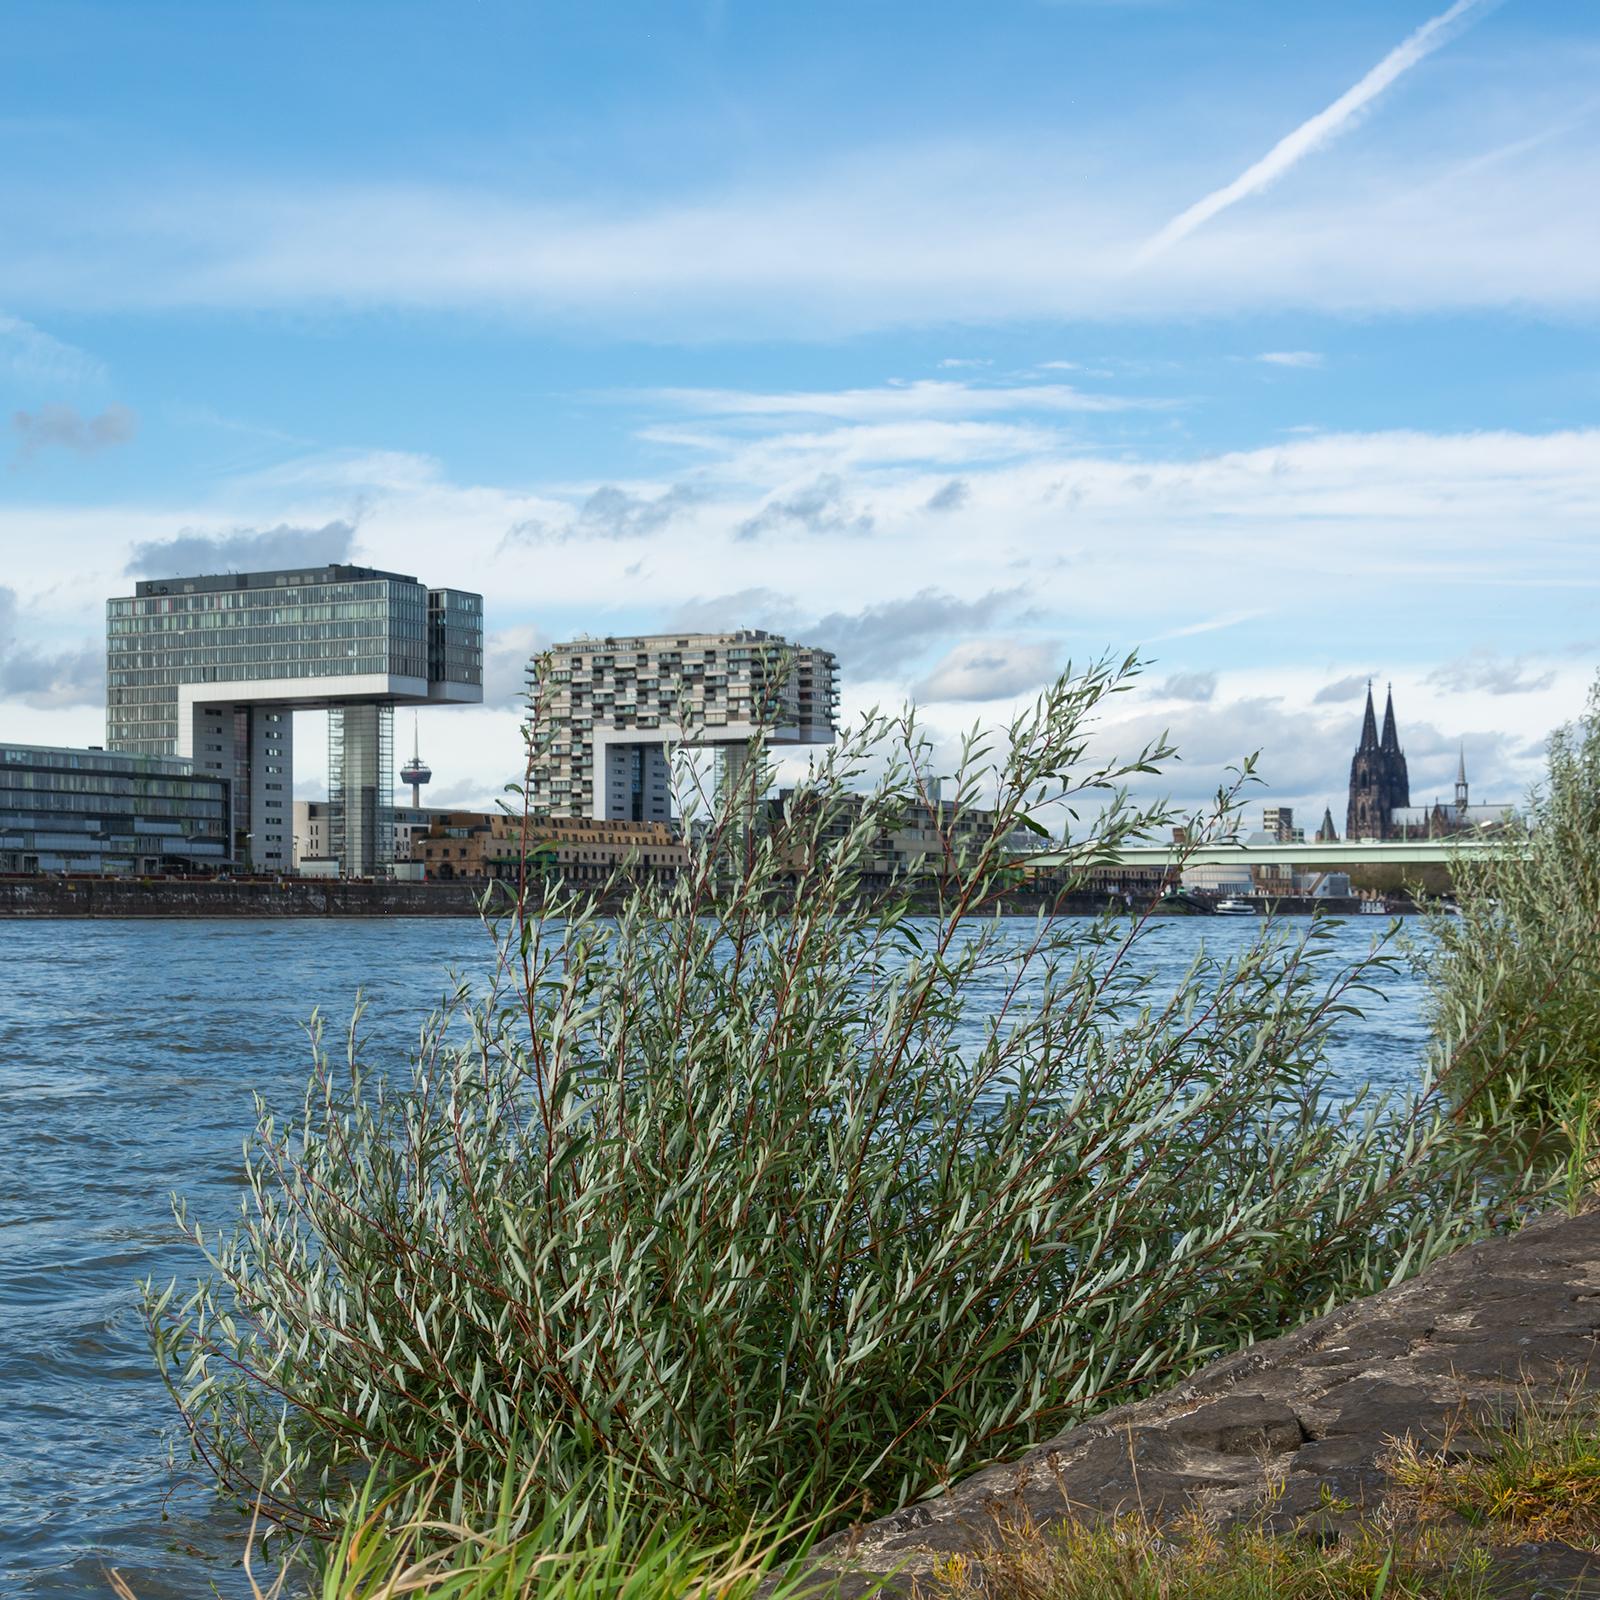 Rhein; Köln; Kranhäuser; Rheinmetropole; Köln mobil 2025